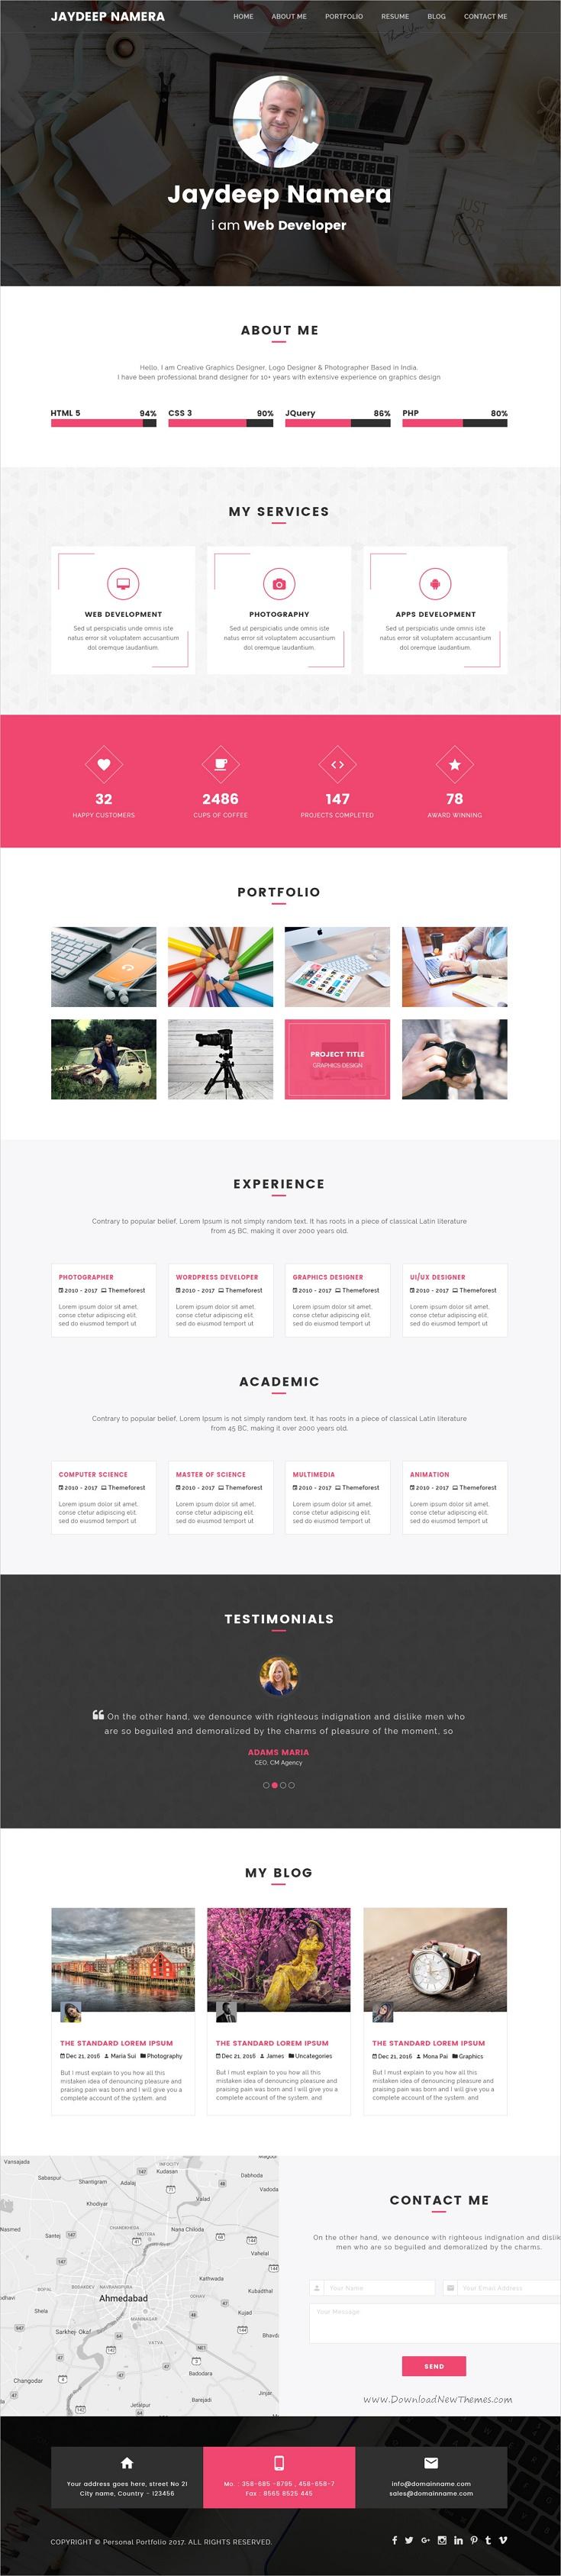 Folder freelancer one page portfolio resume psd